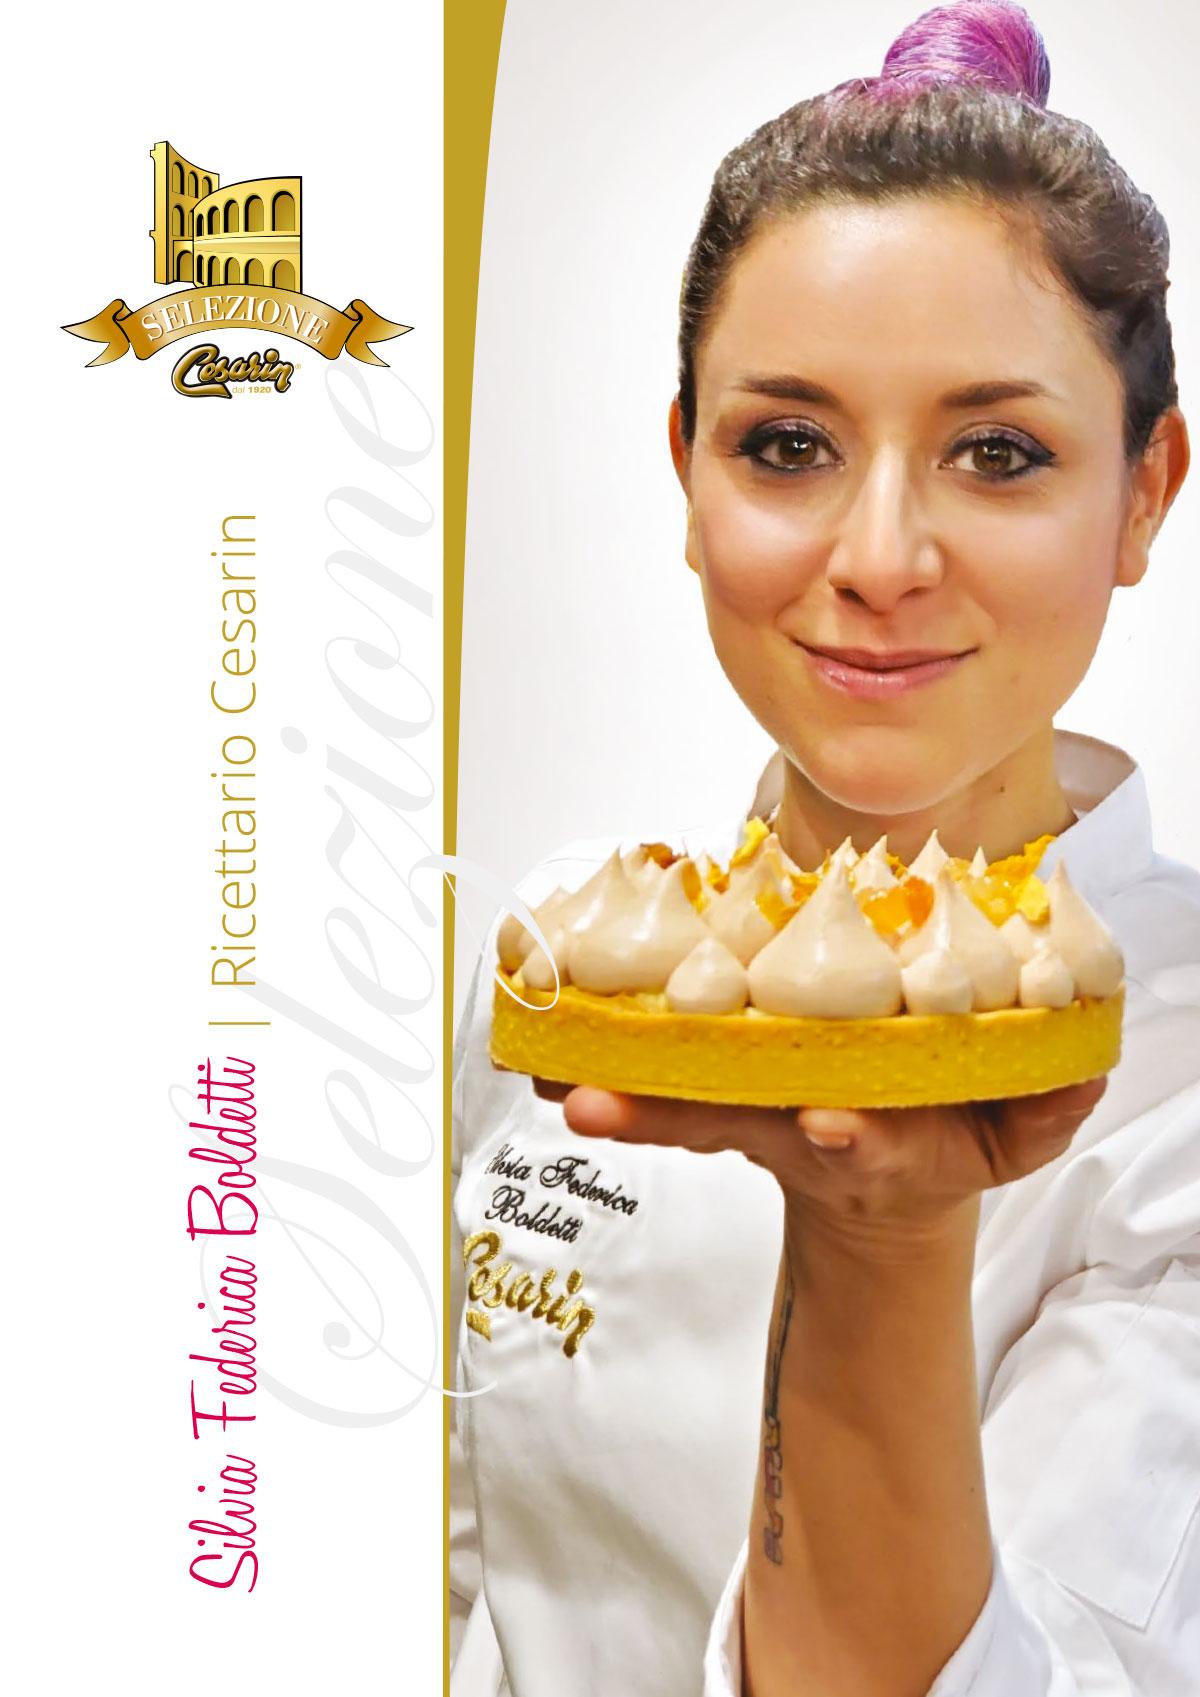 Ricettario Boldetti